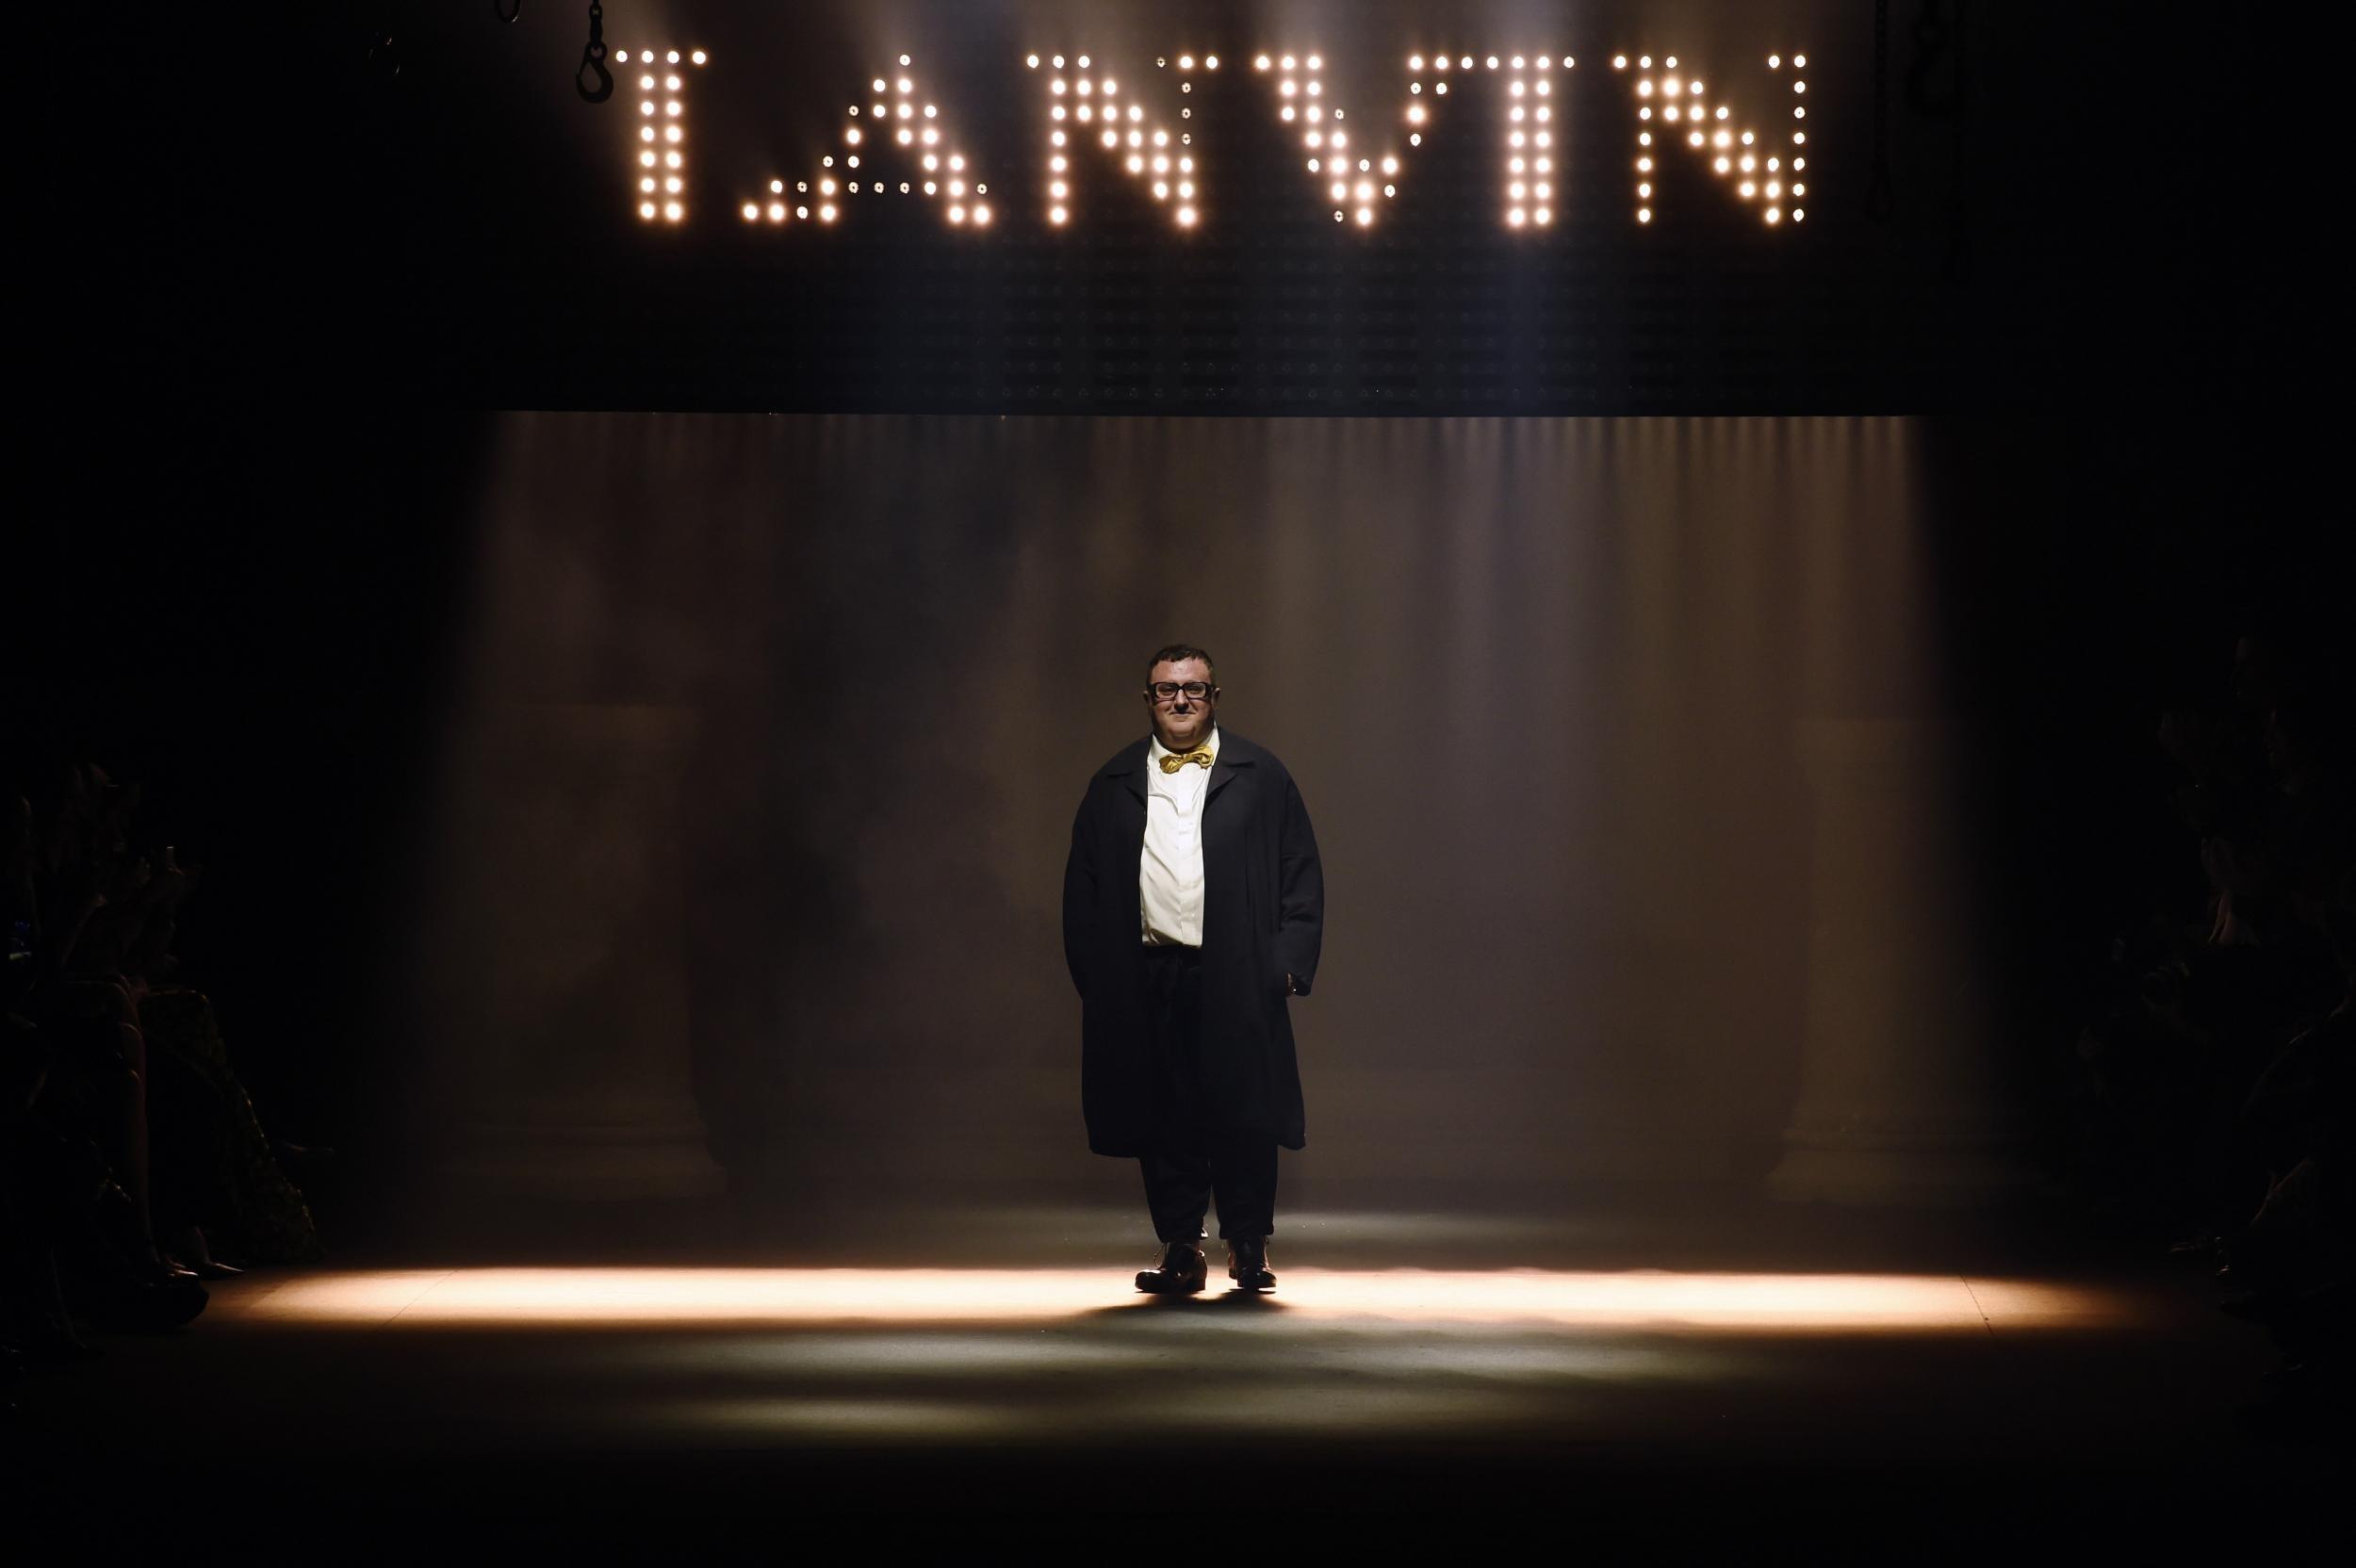 Alber Elbaz Is Leaving Lanvin